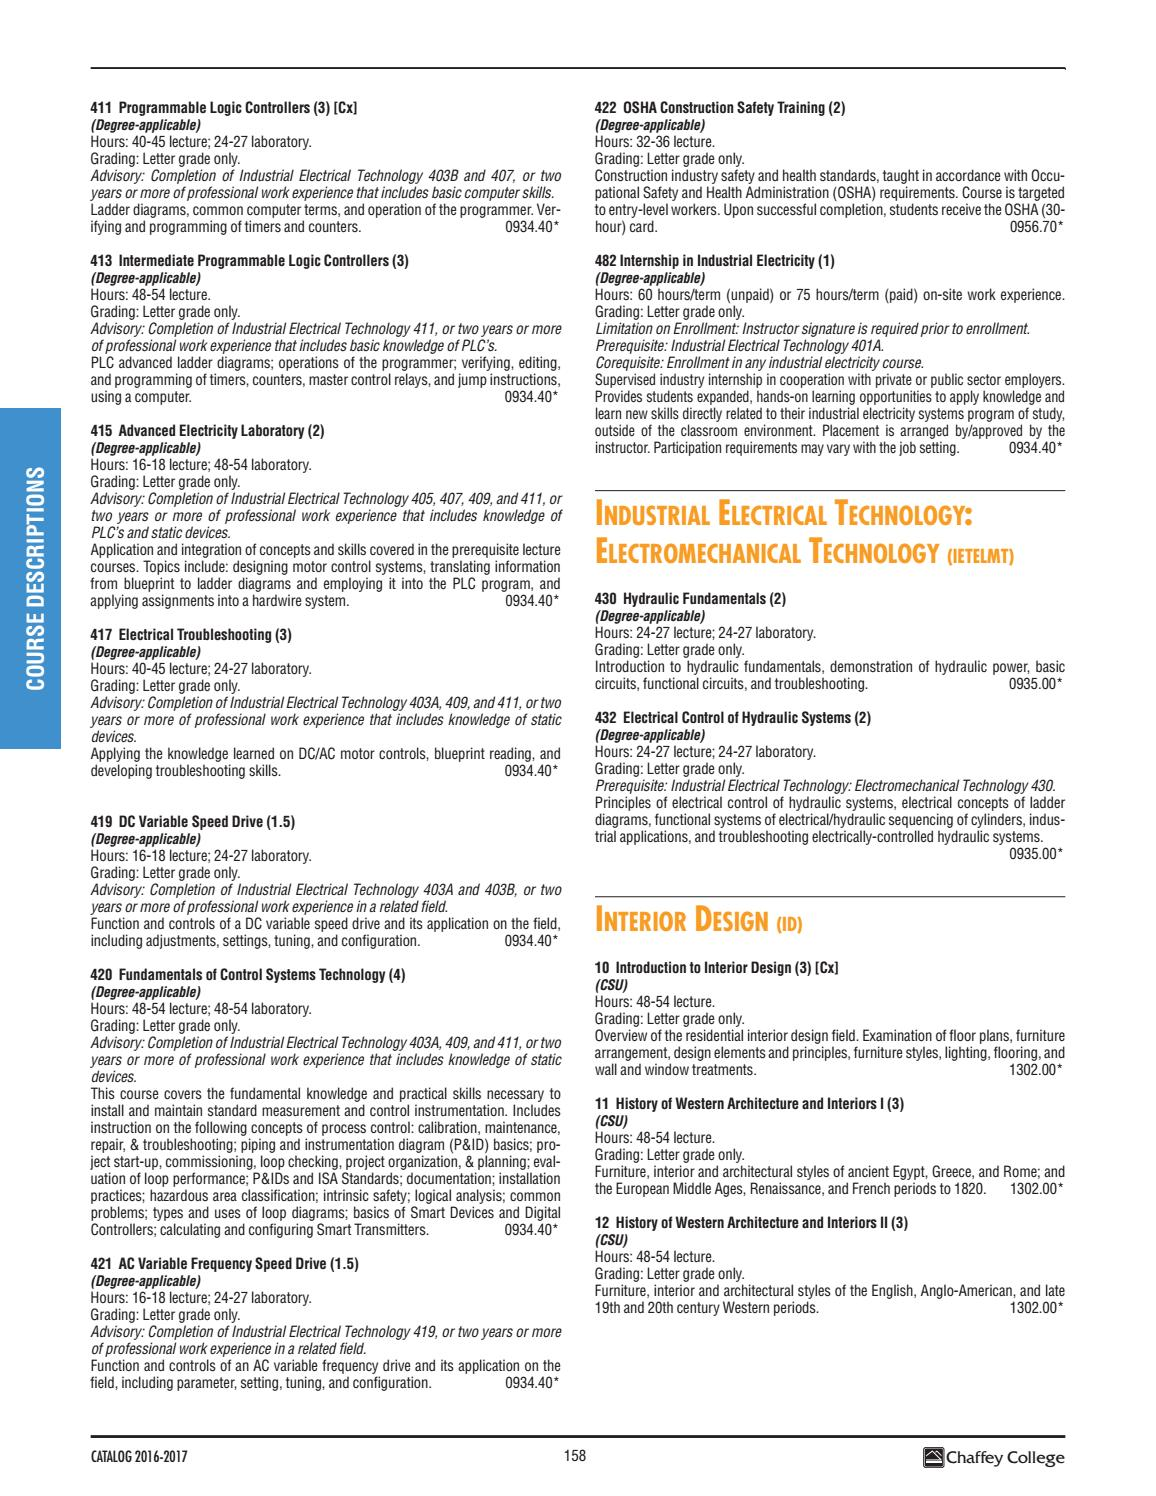 Chaffey College Catalog 2016 2017 by Chaffey College - issuu